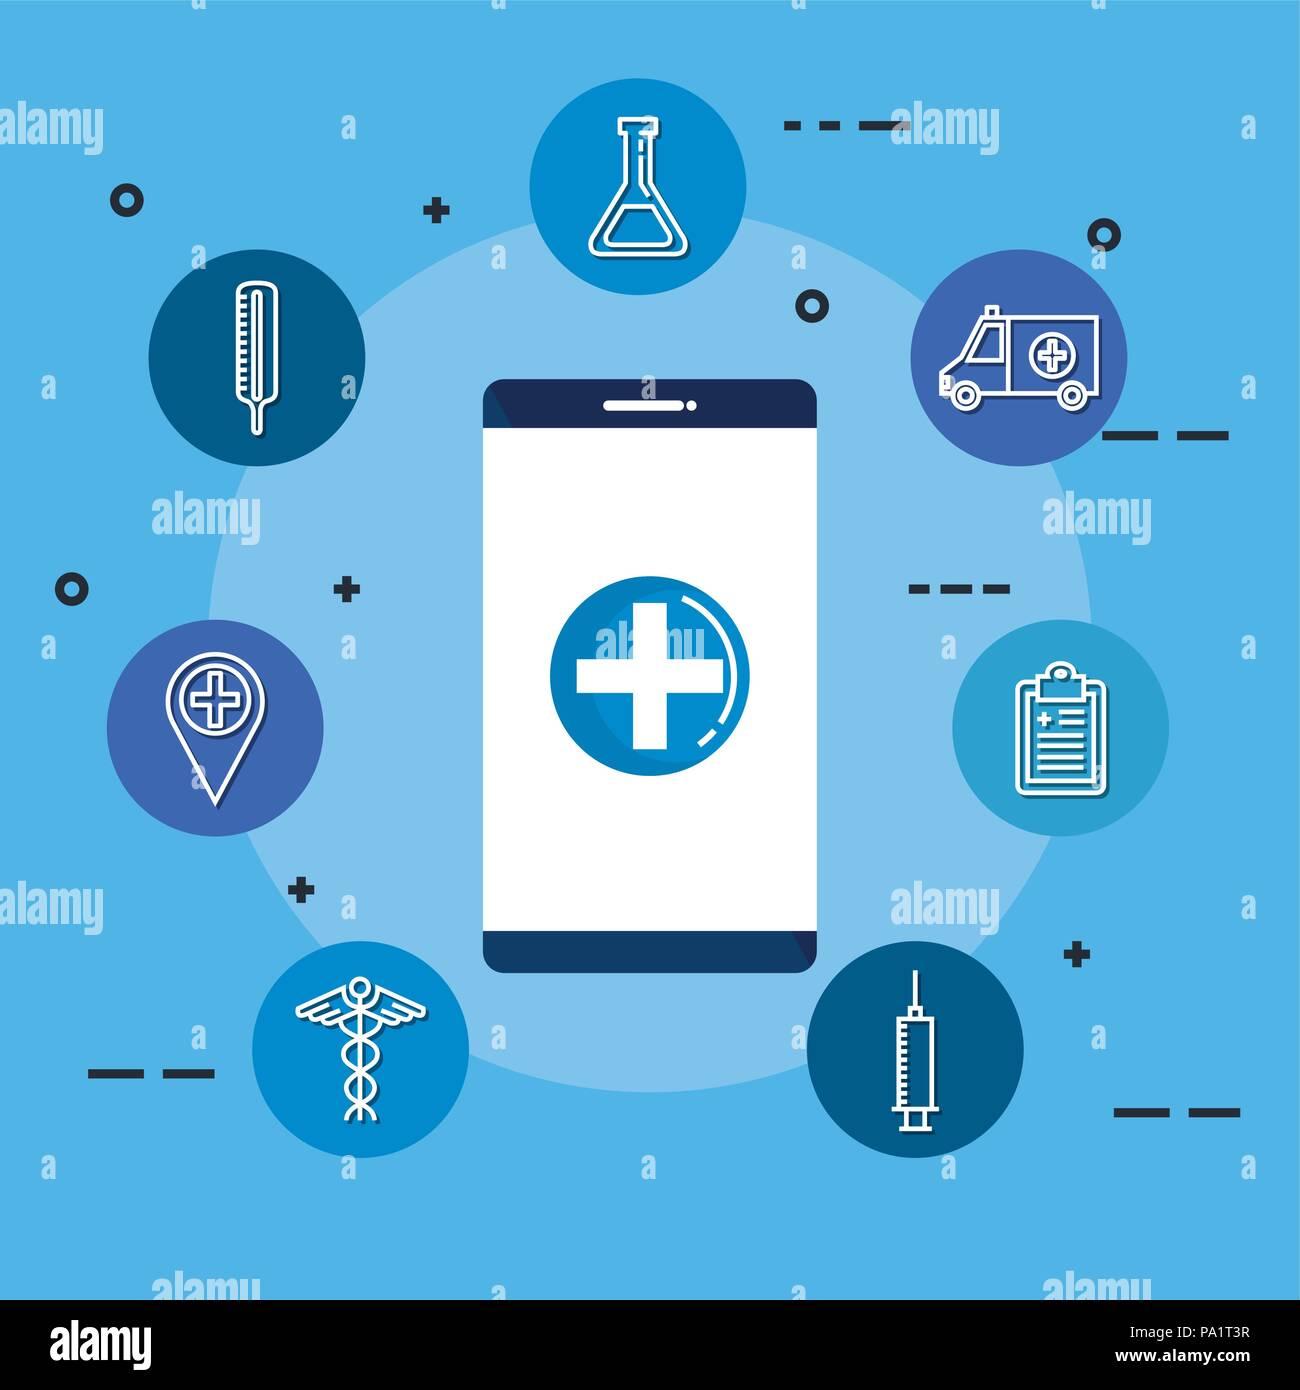 smartphone with telemedicine icons - Stock Image